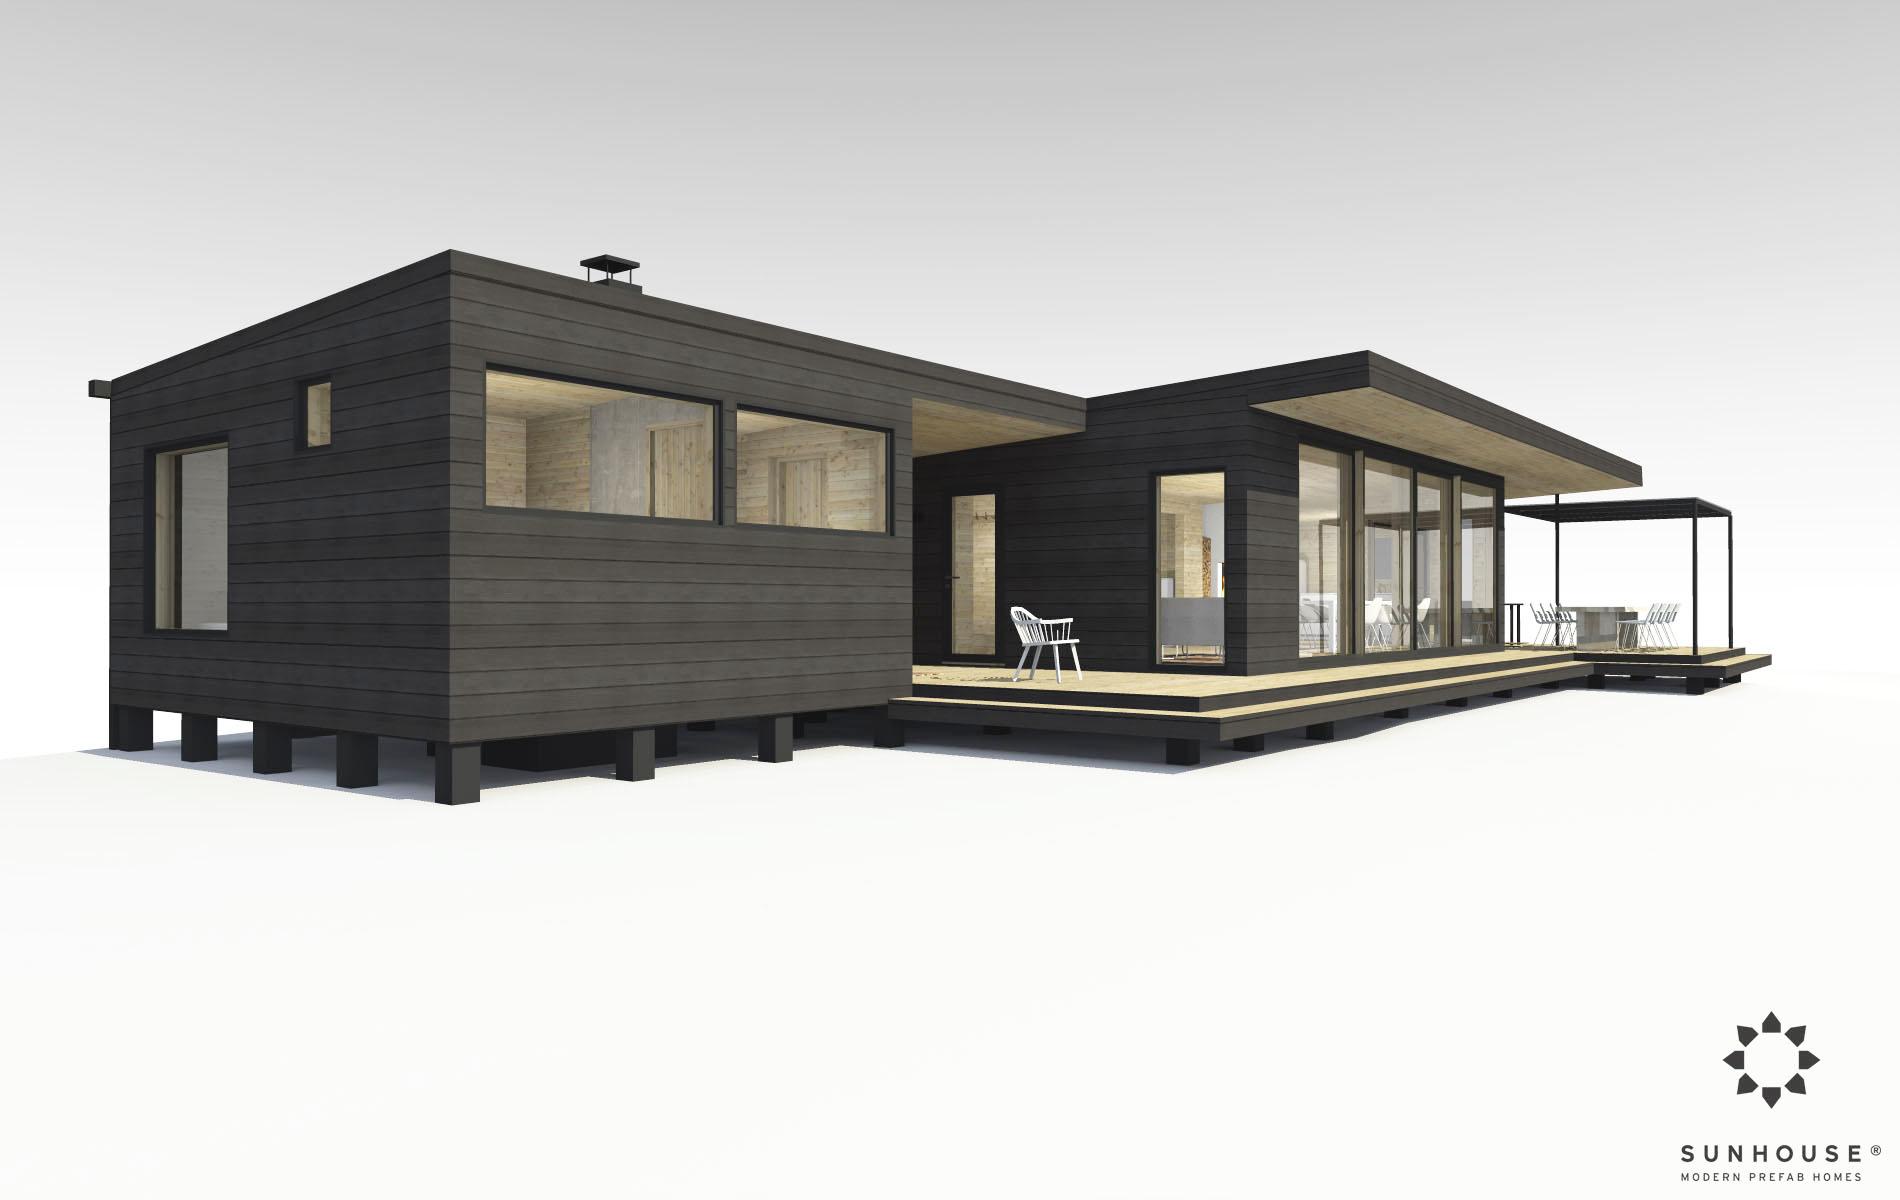 Sunhouse moderni huvila S1419_ulkoa (1)